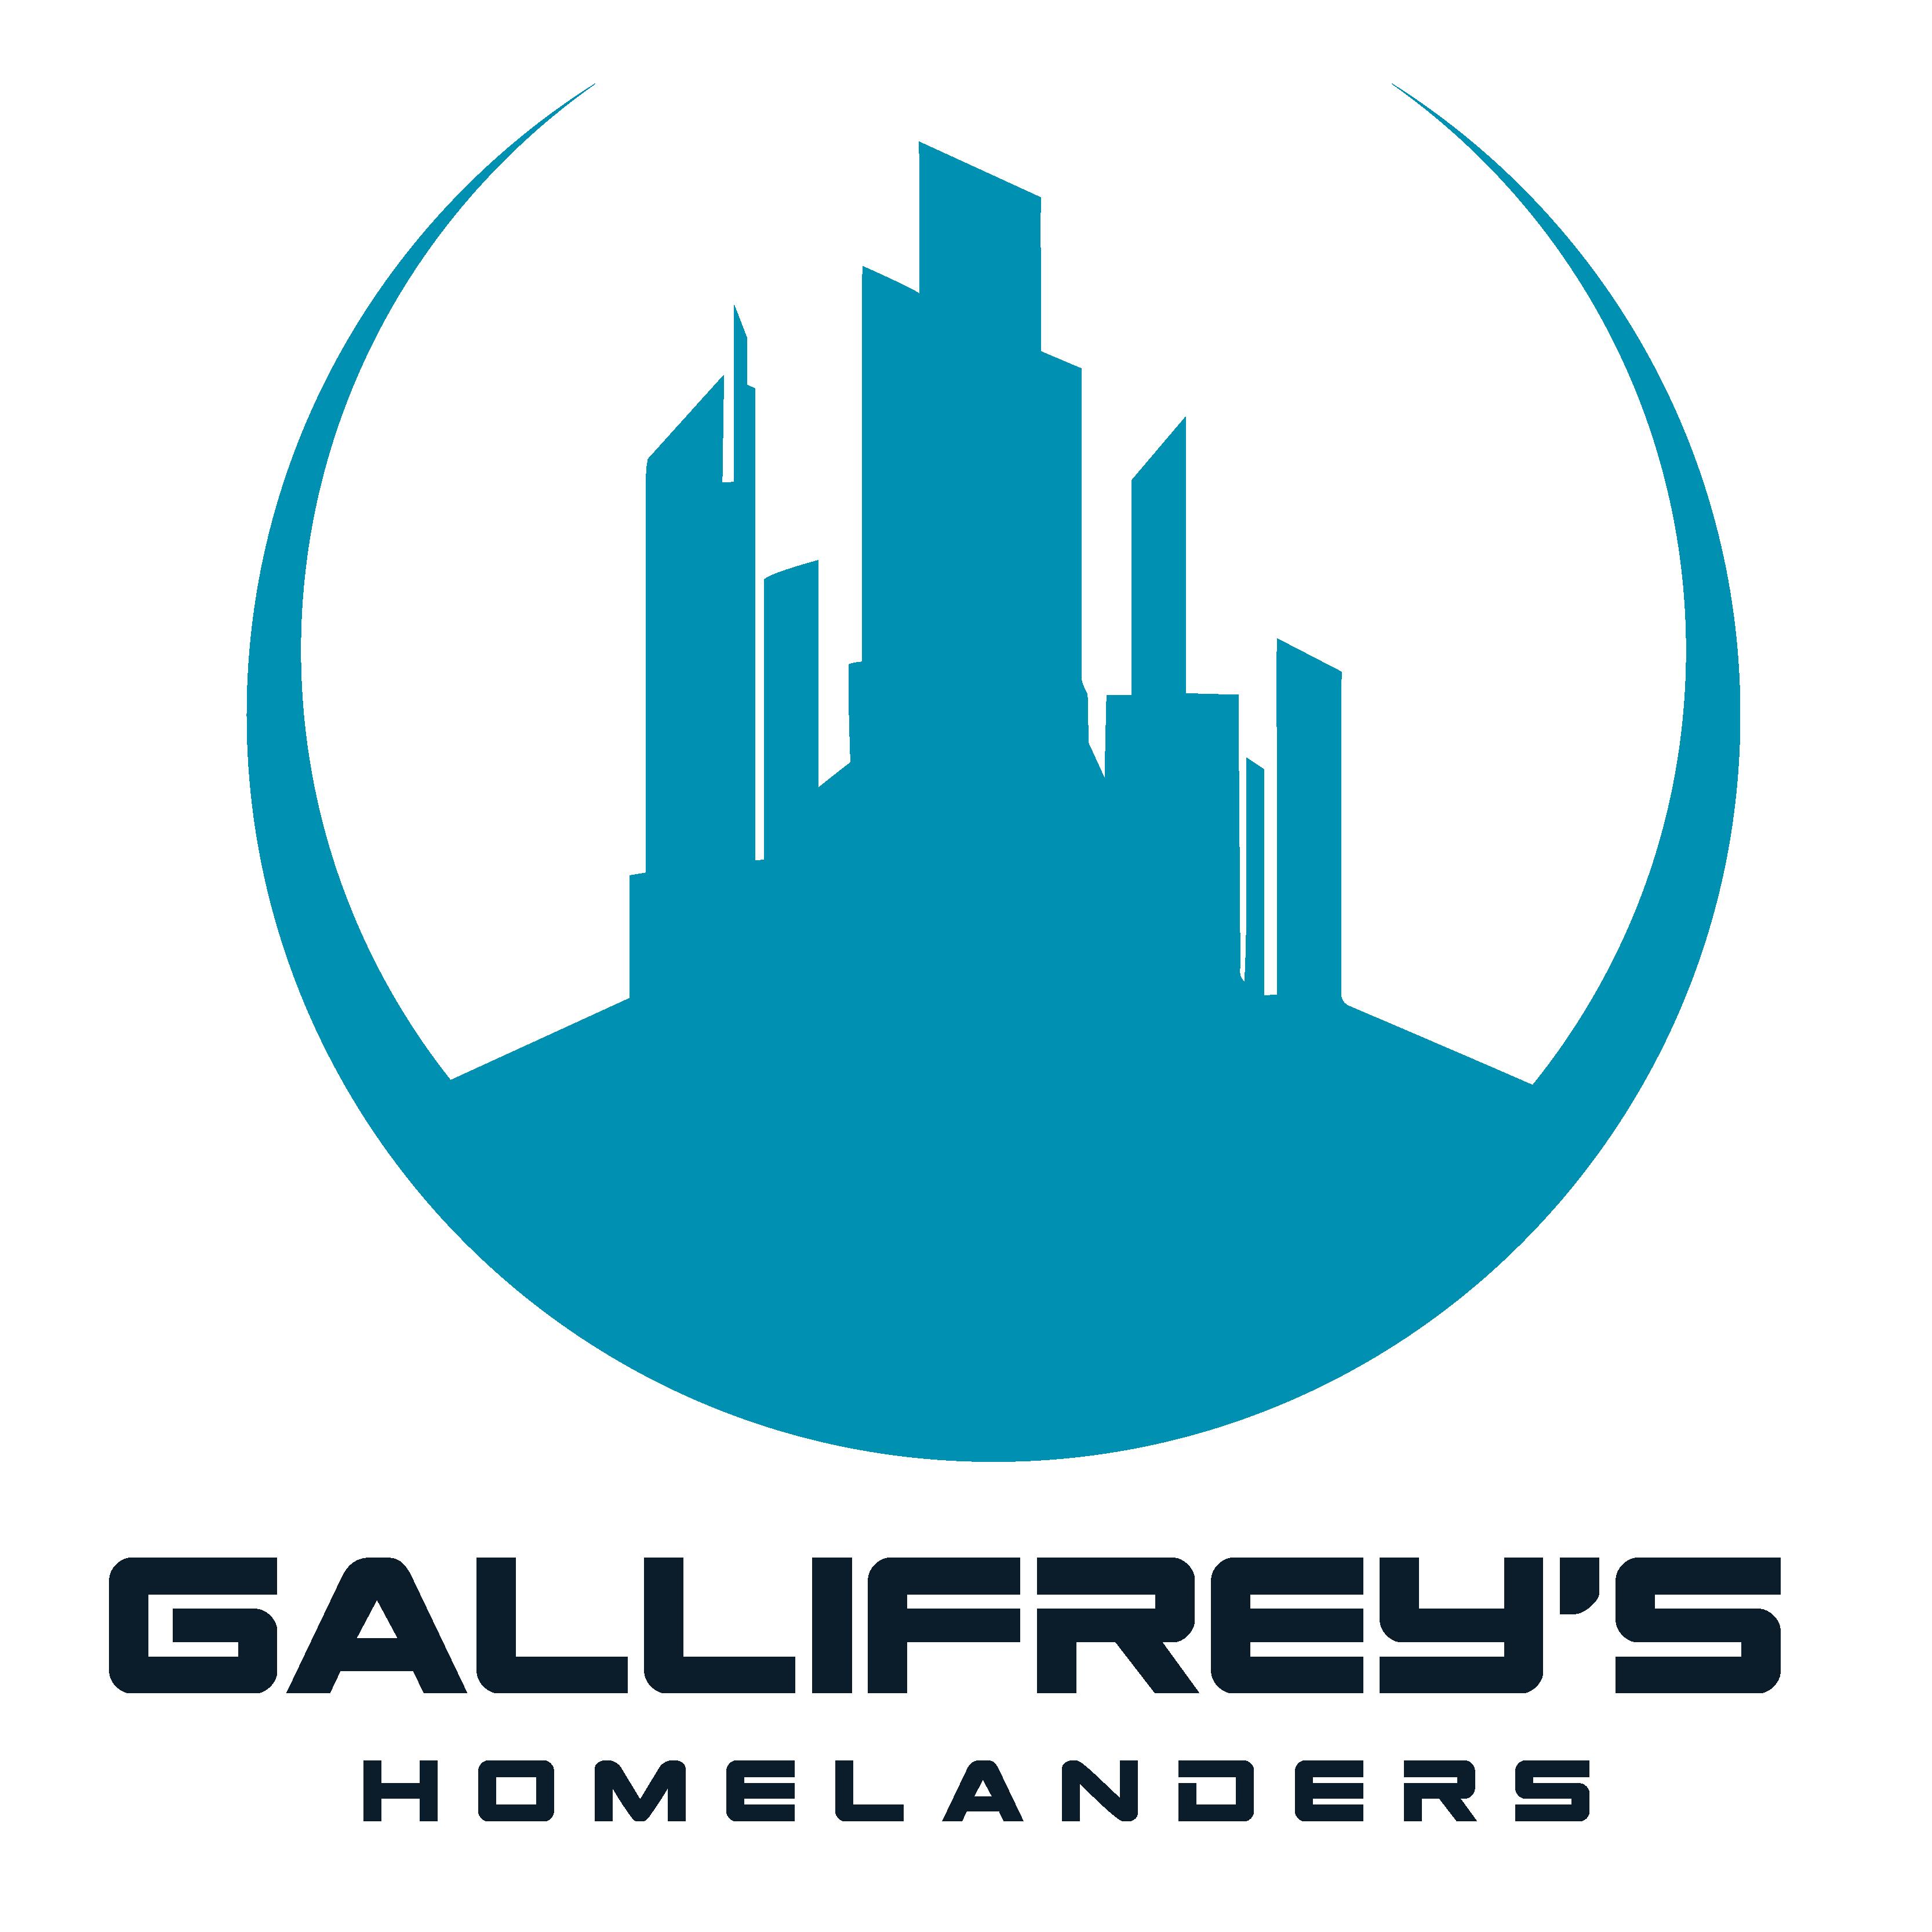 GallifreysHomelanders.png